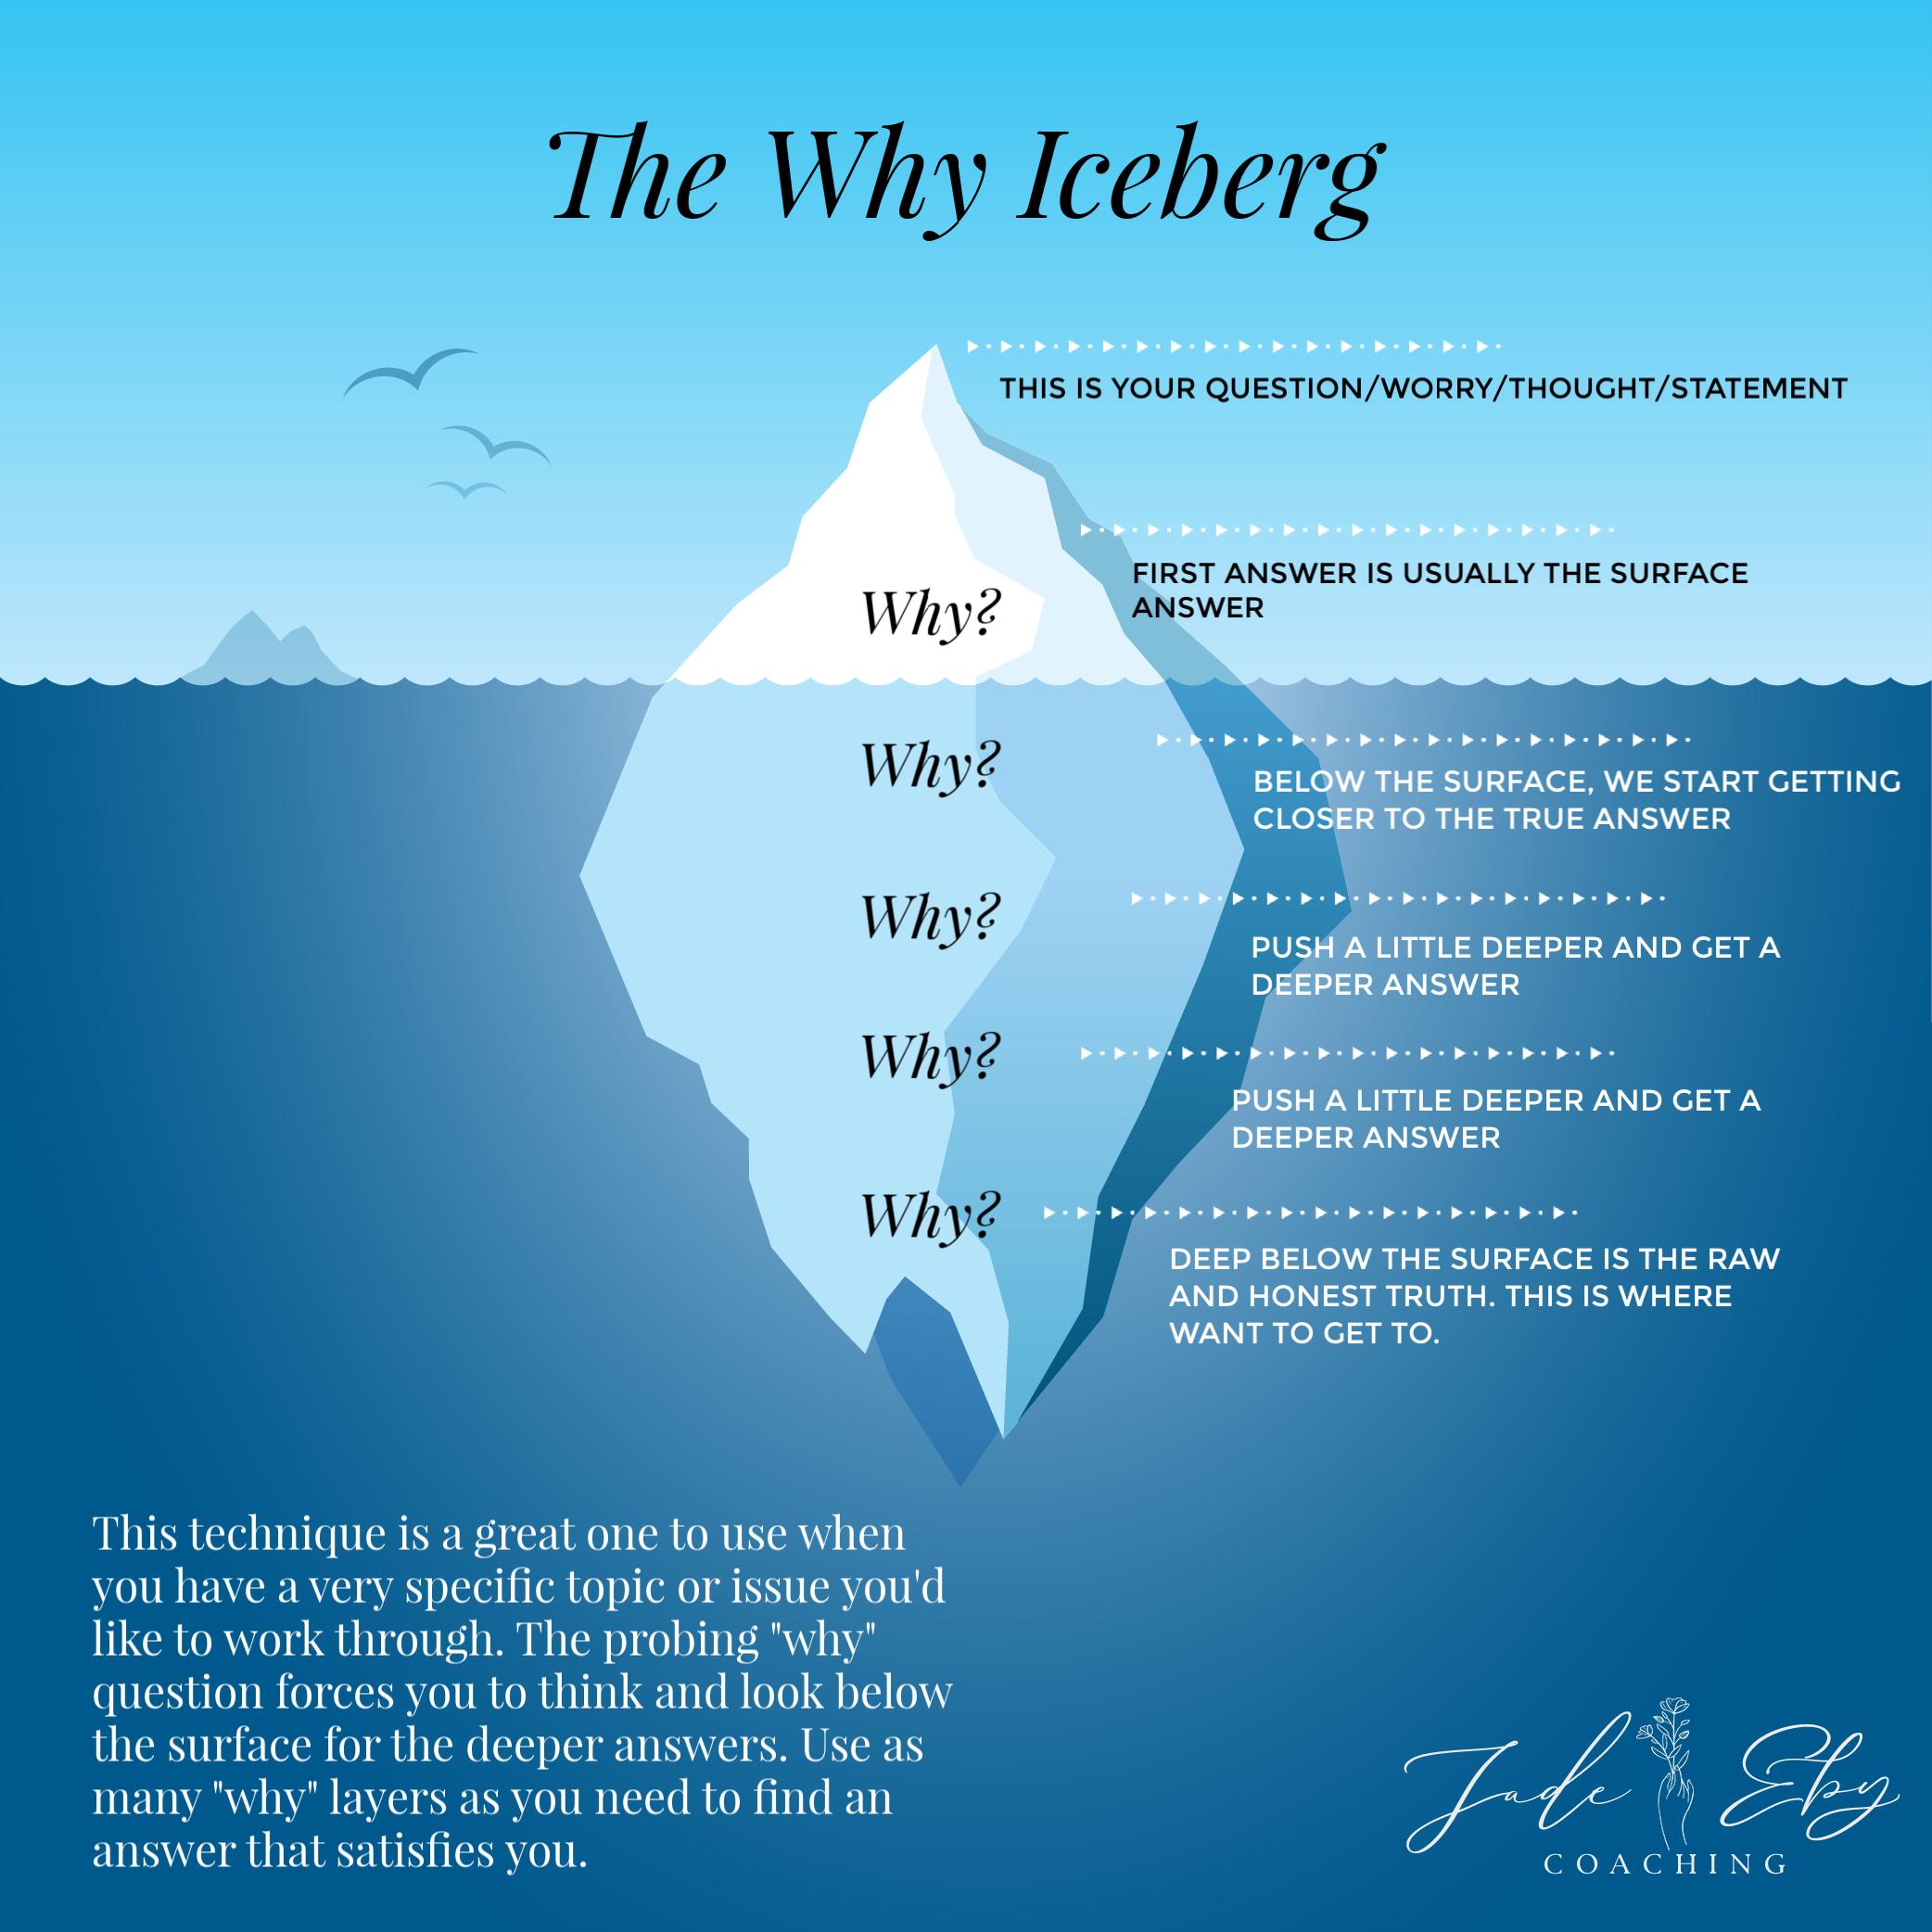 iceberg metaphor.png